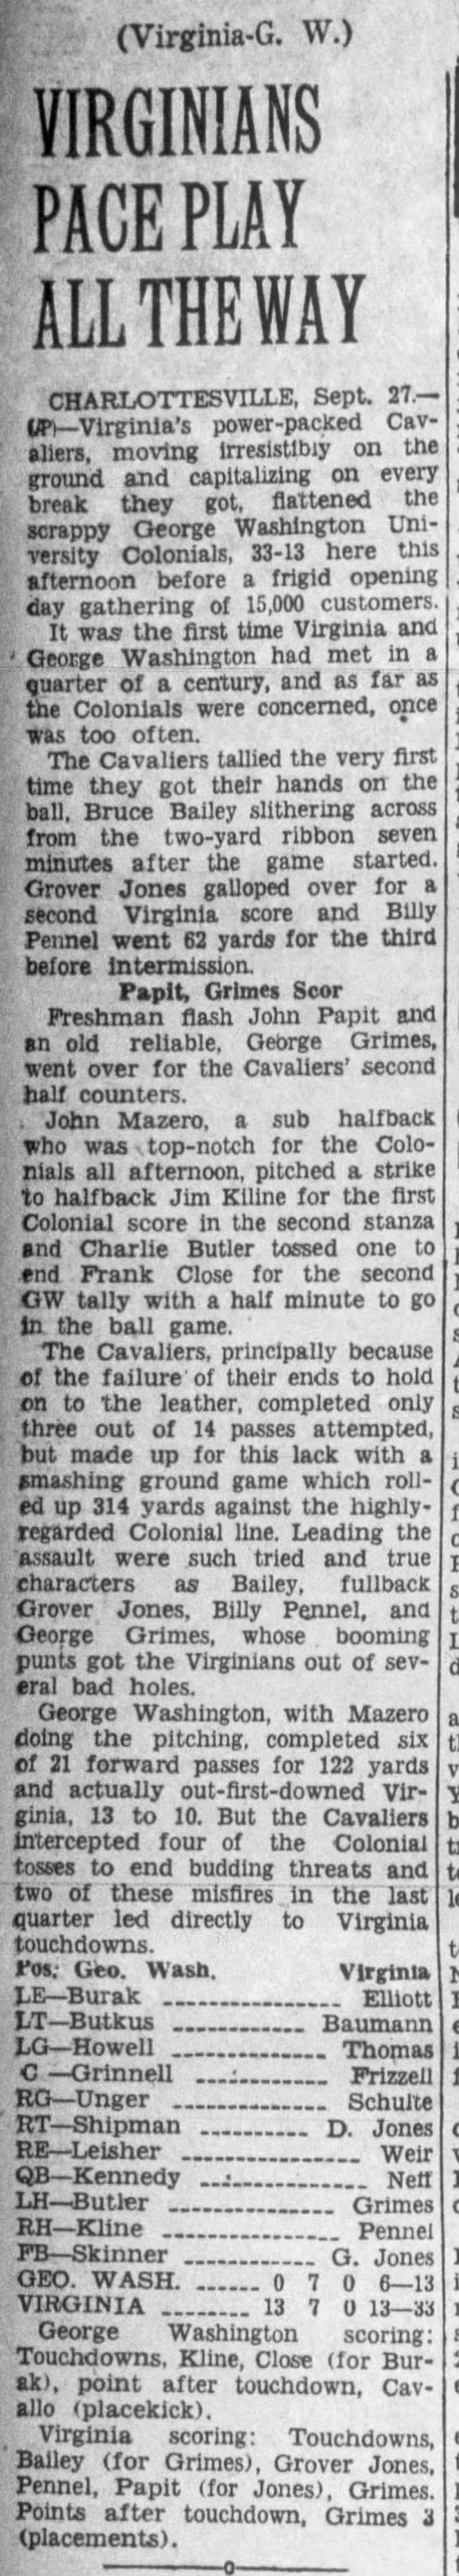 Cavaliers Roll Up 33-13 Score Over George Washington -